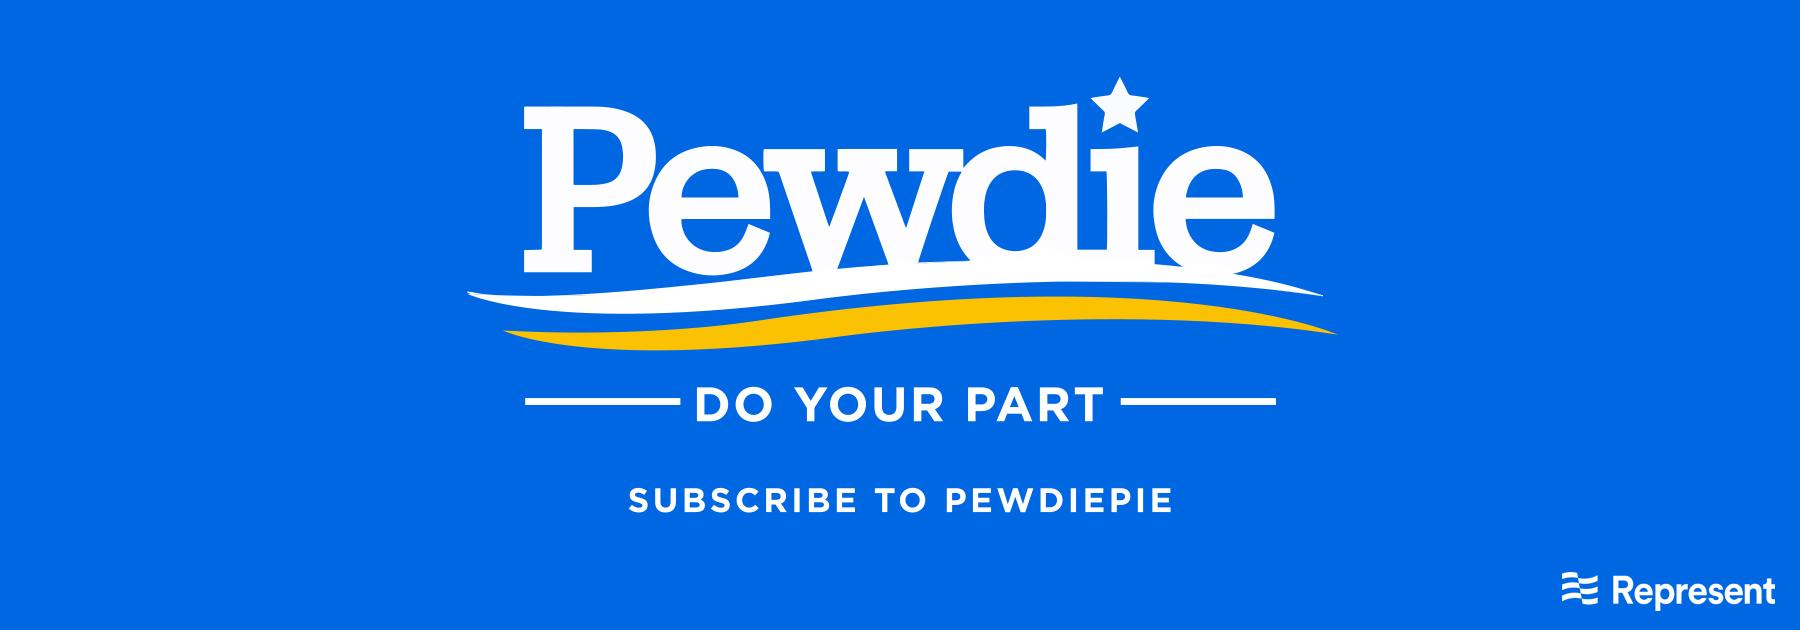 Subscribe to pewdiepie - 1 part 10